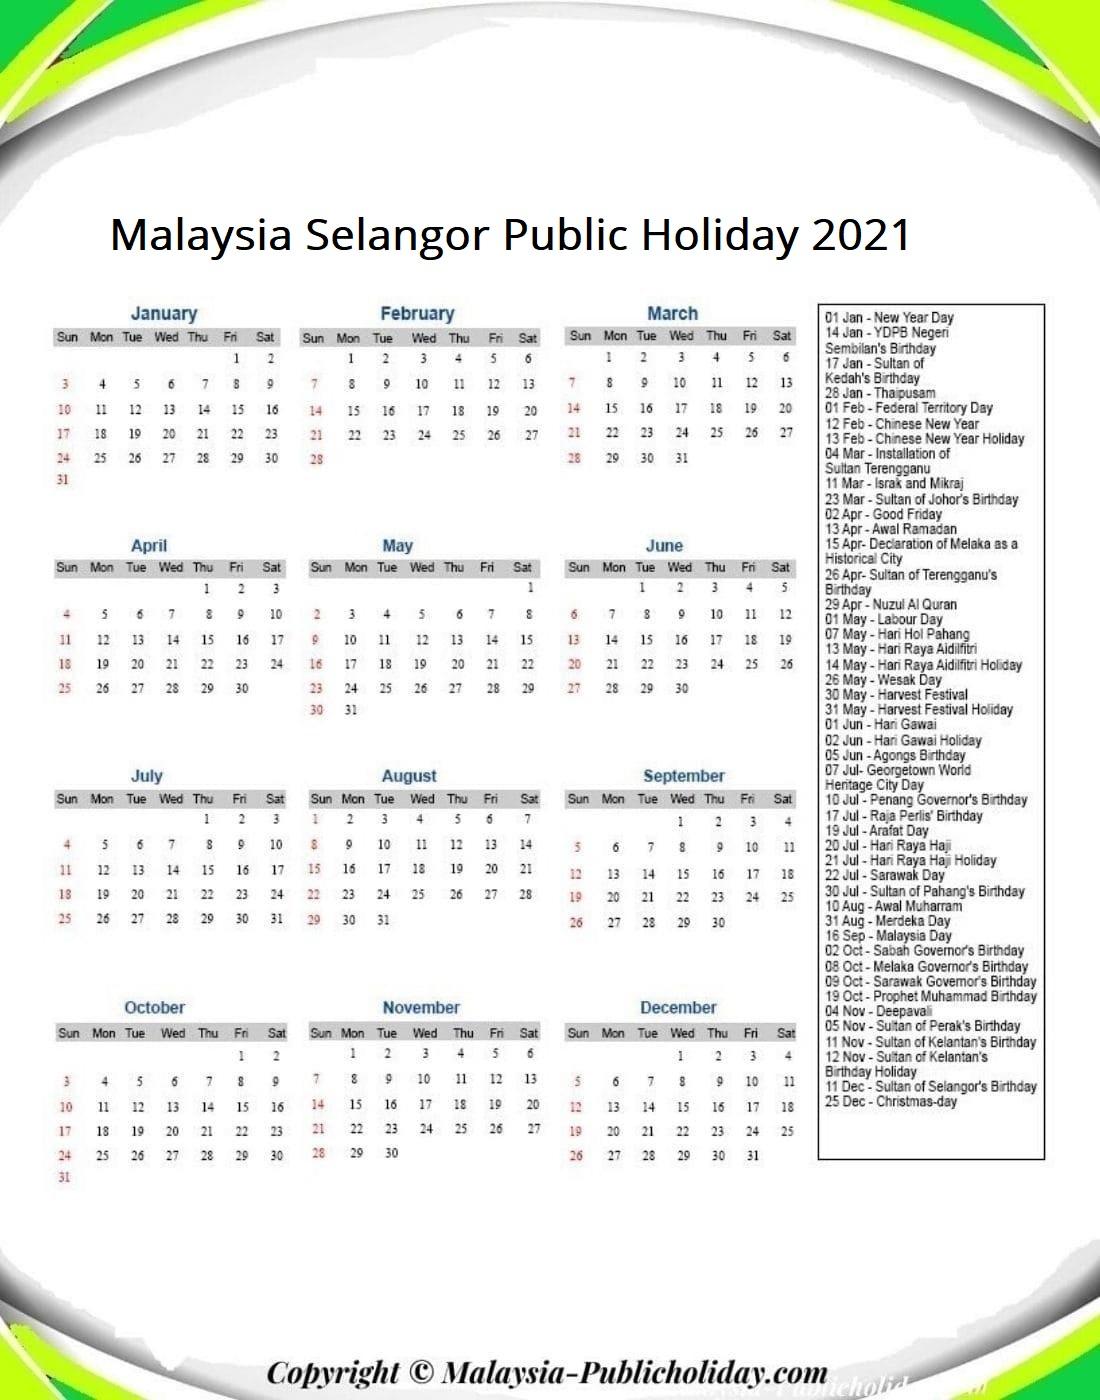 Selangor Calendars with Holidays 2021